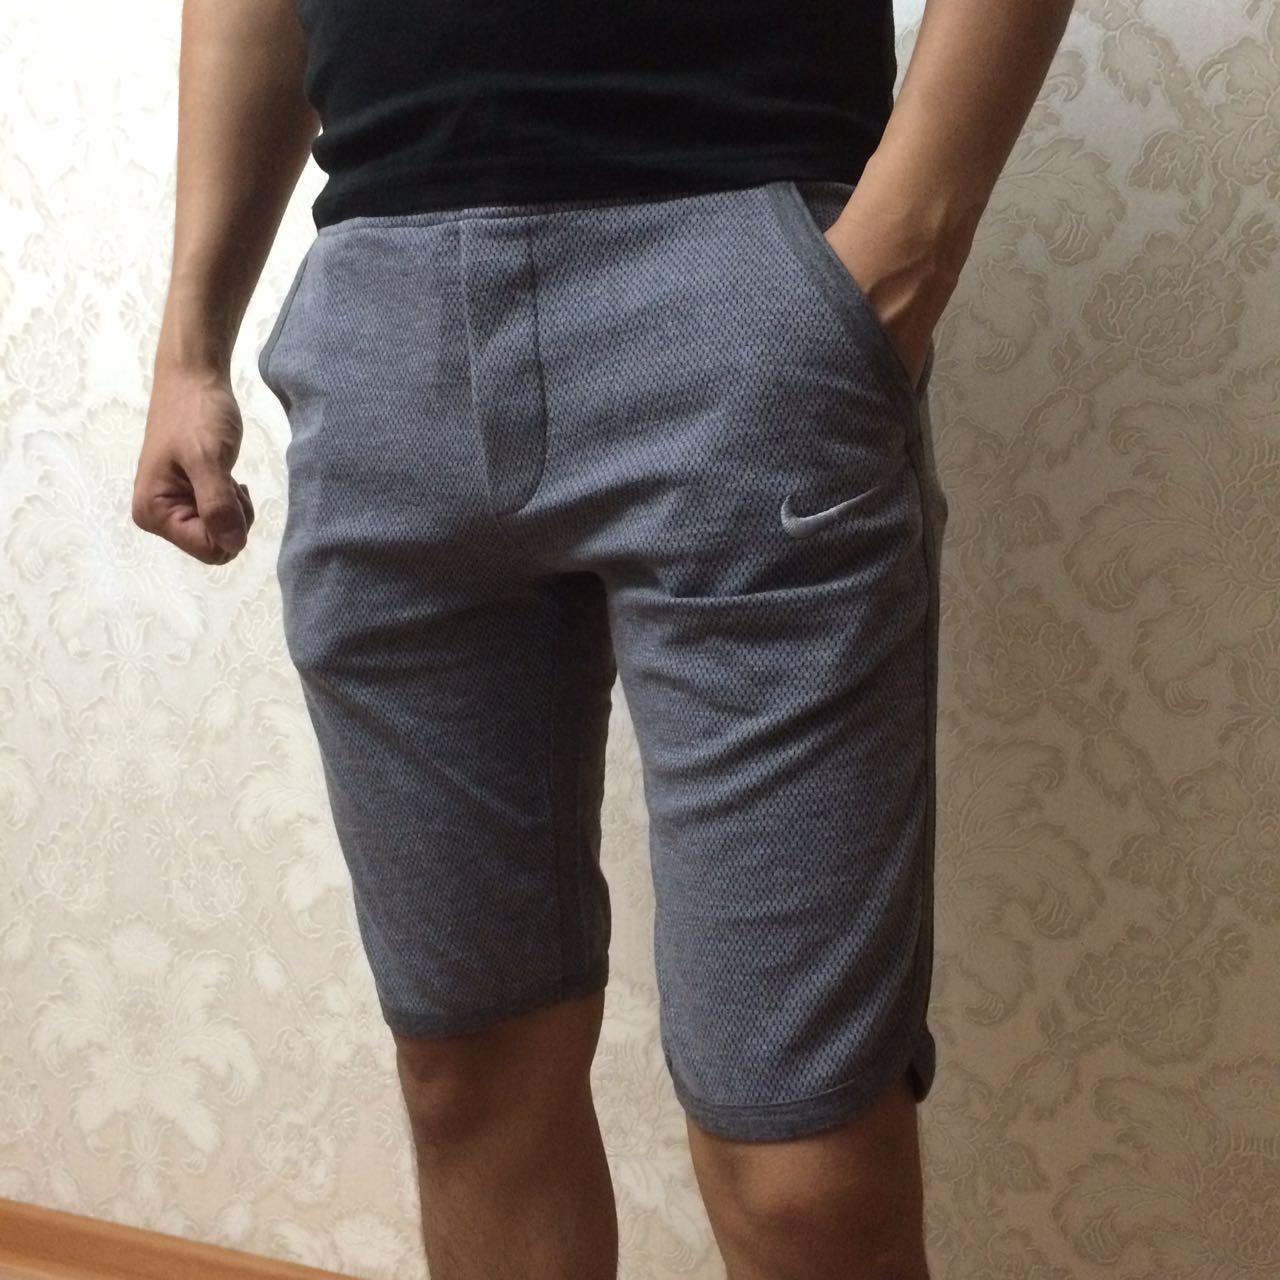 Турецкие шорты Nike - фото 2